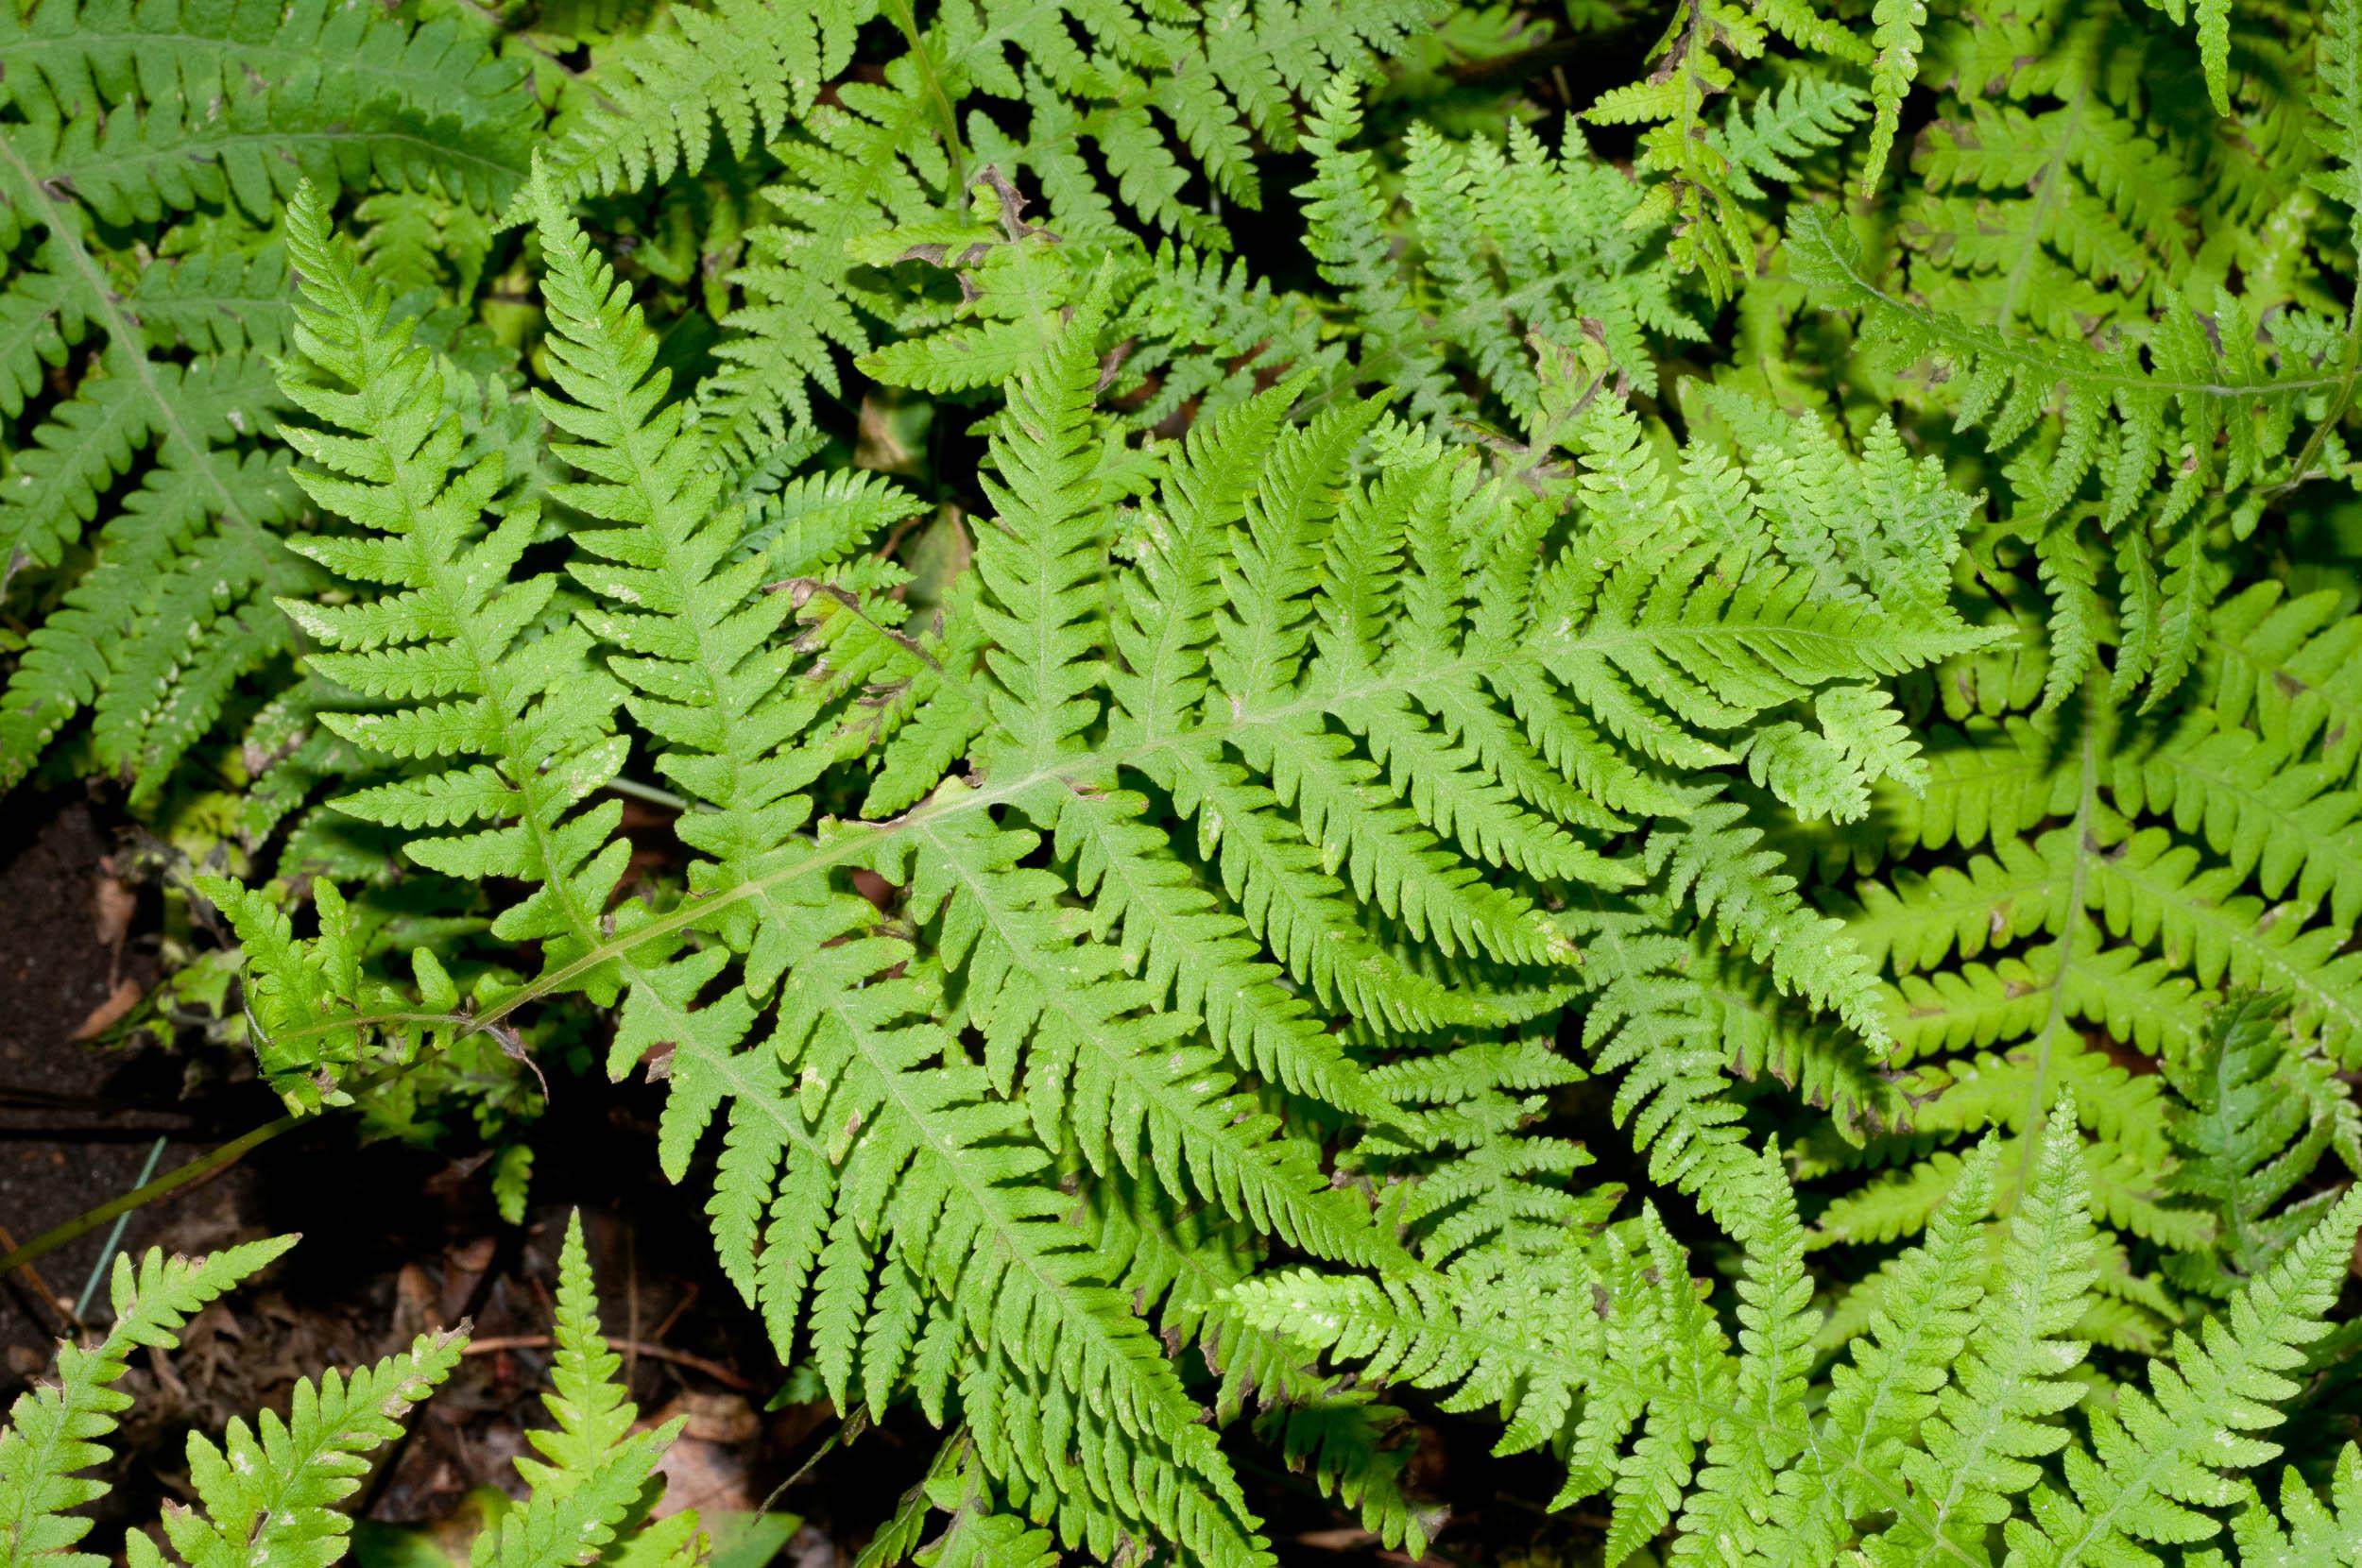 Broad leaf fern pictures Business women s appearance management, career development